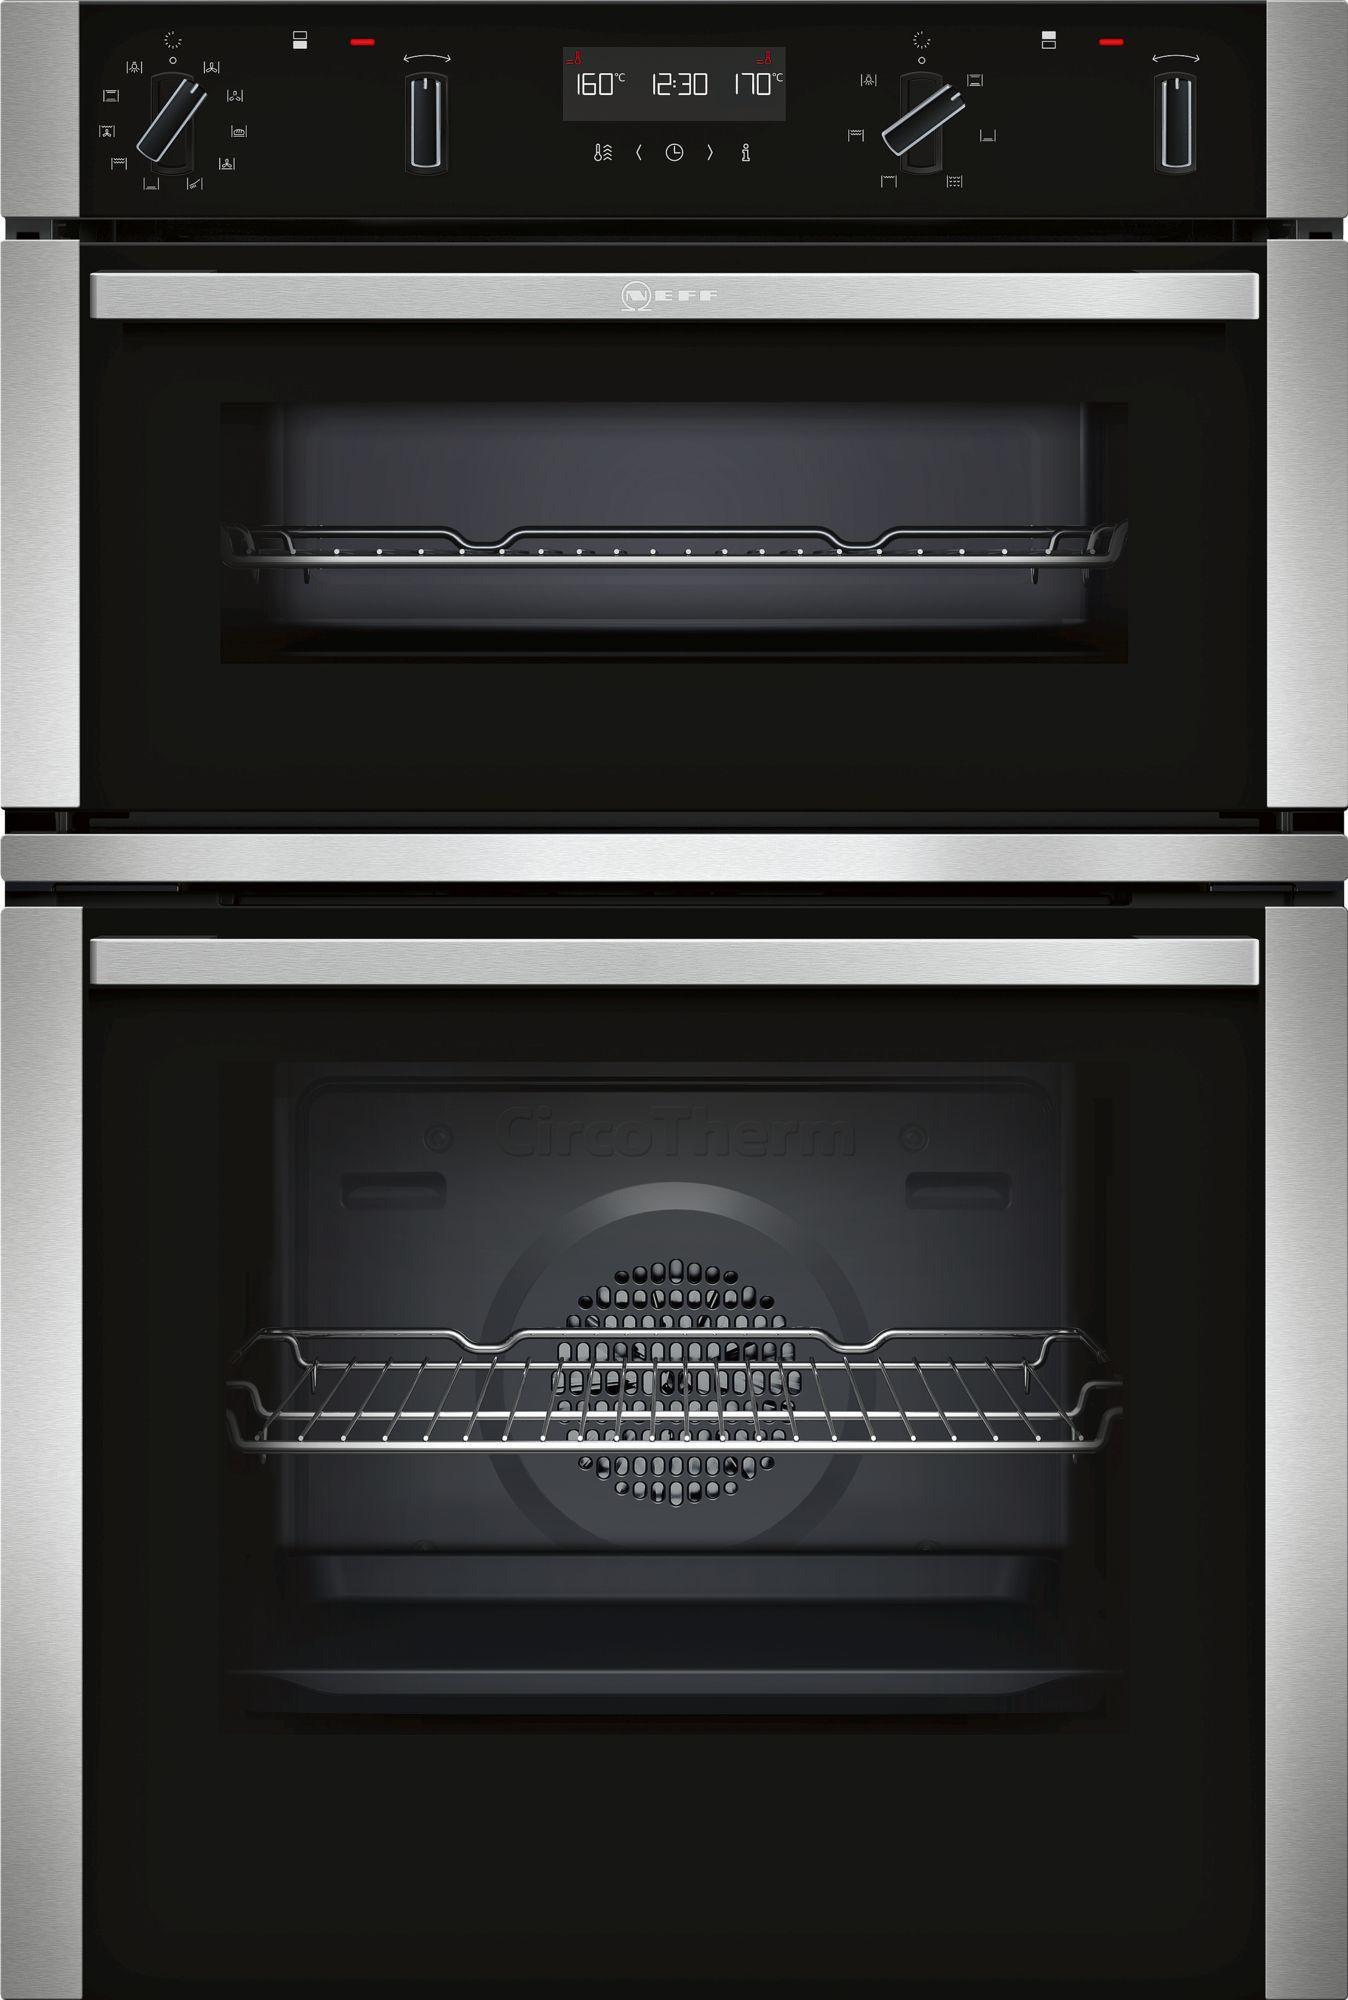 Neff N50 Double Pyrolytic Oven U2ACM7HH0B